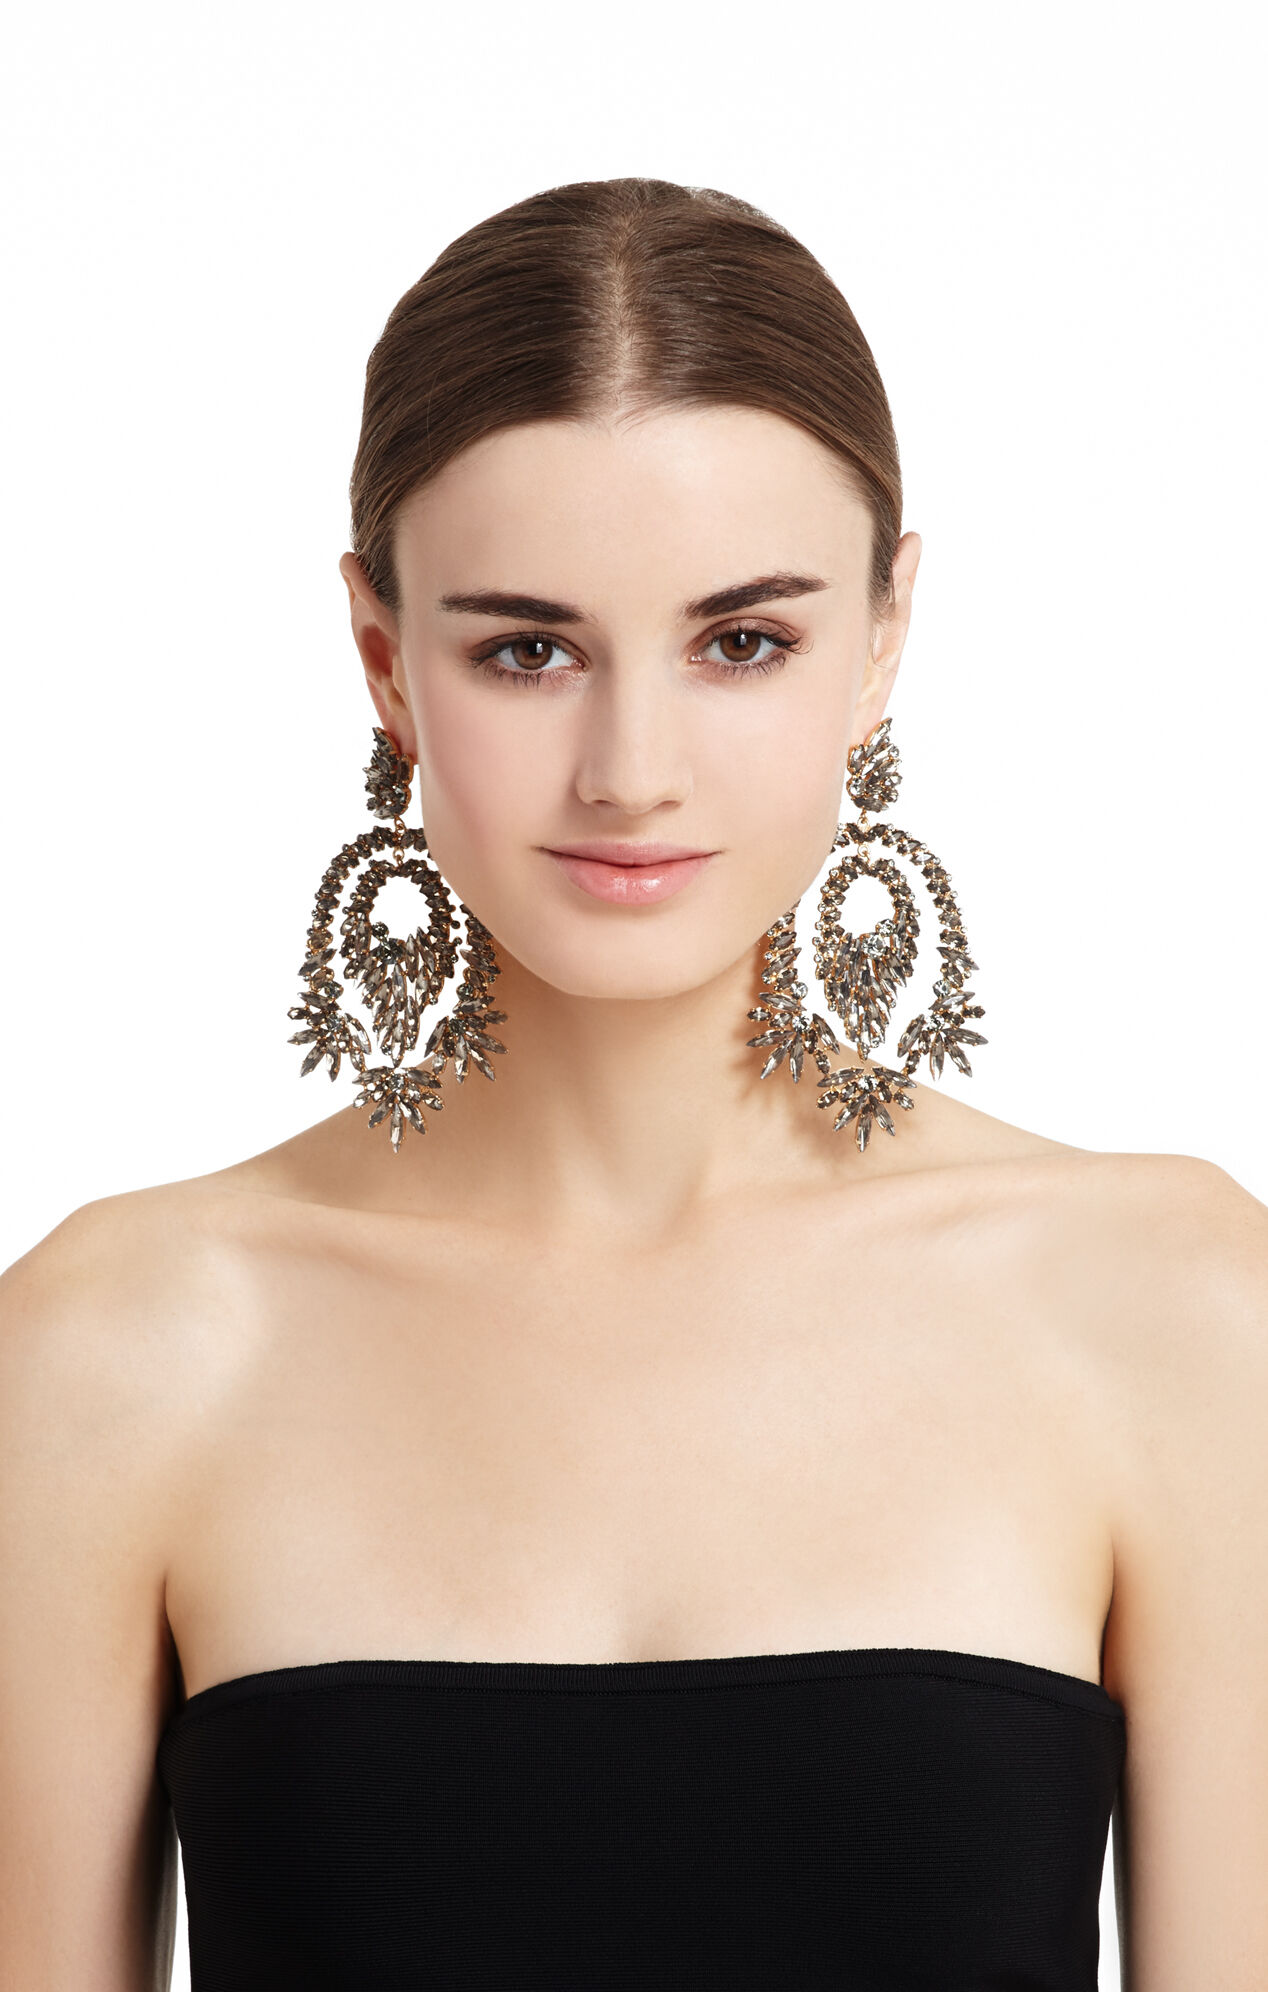 Oversized Rhinestone Cocktail Earrings